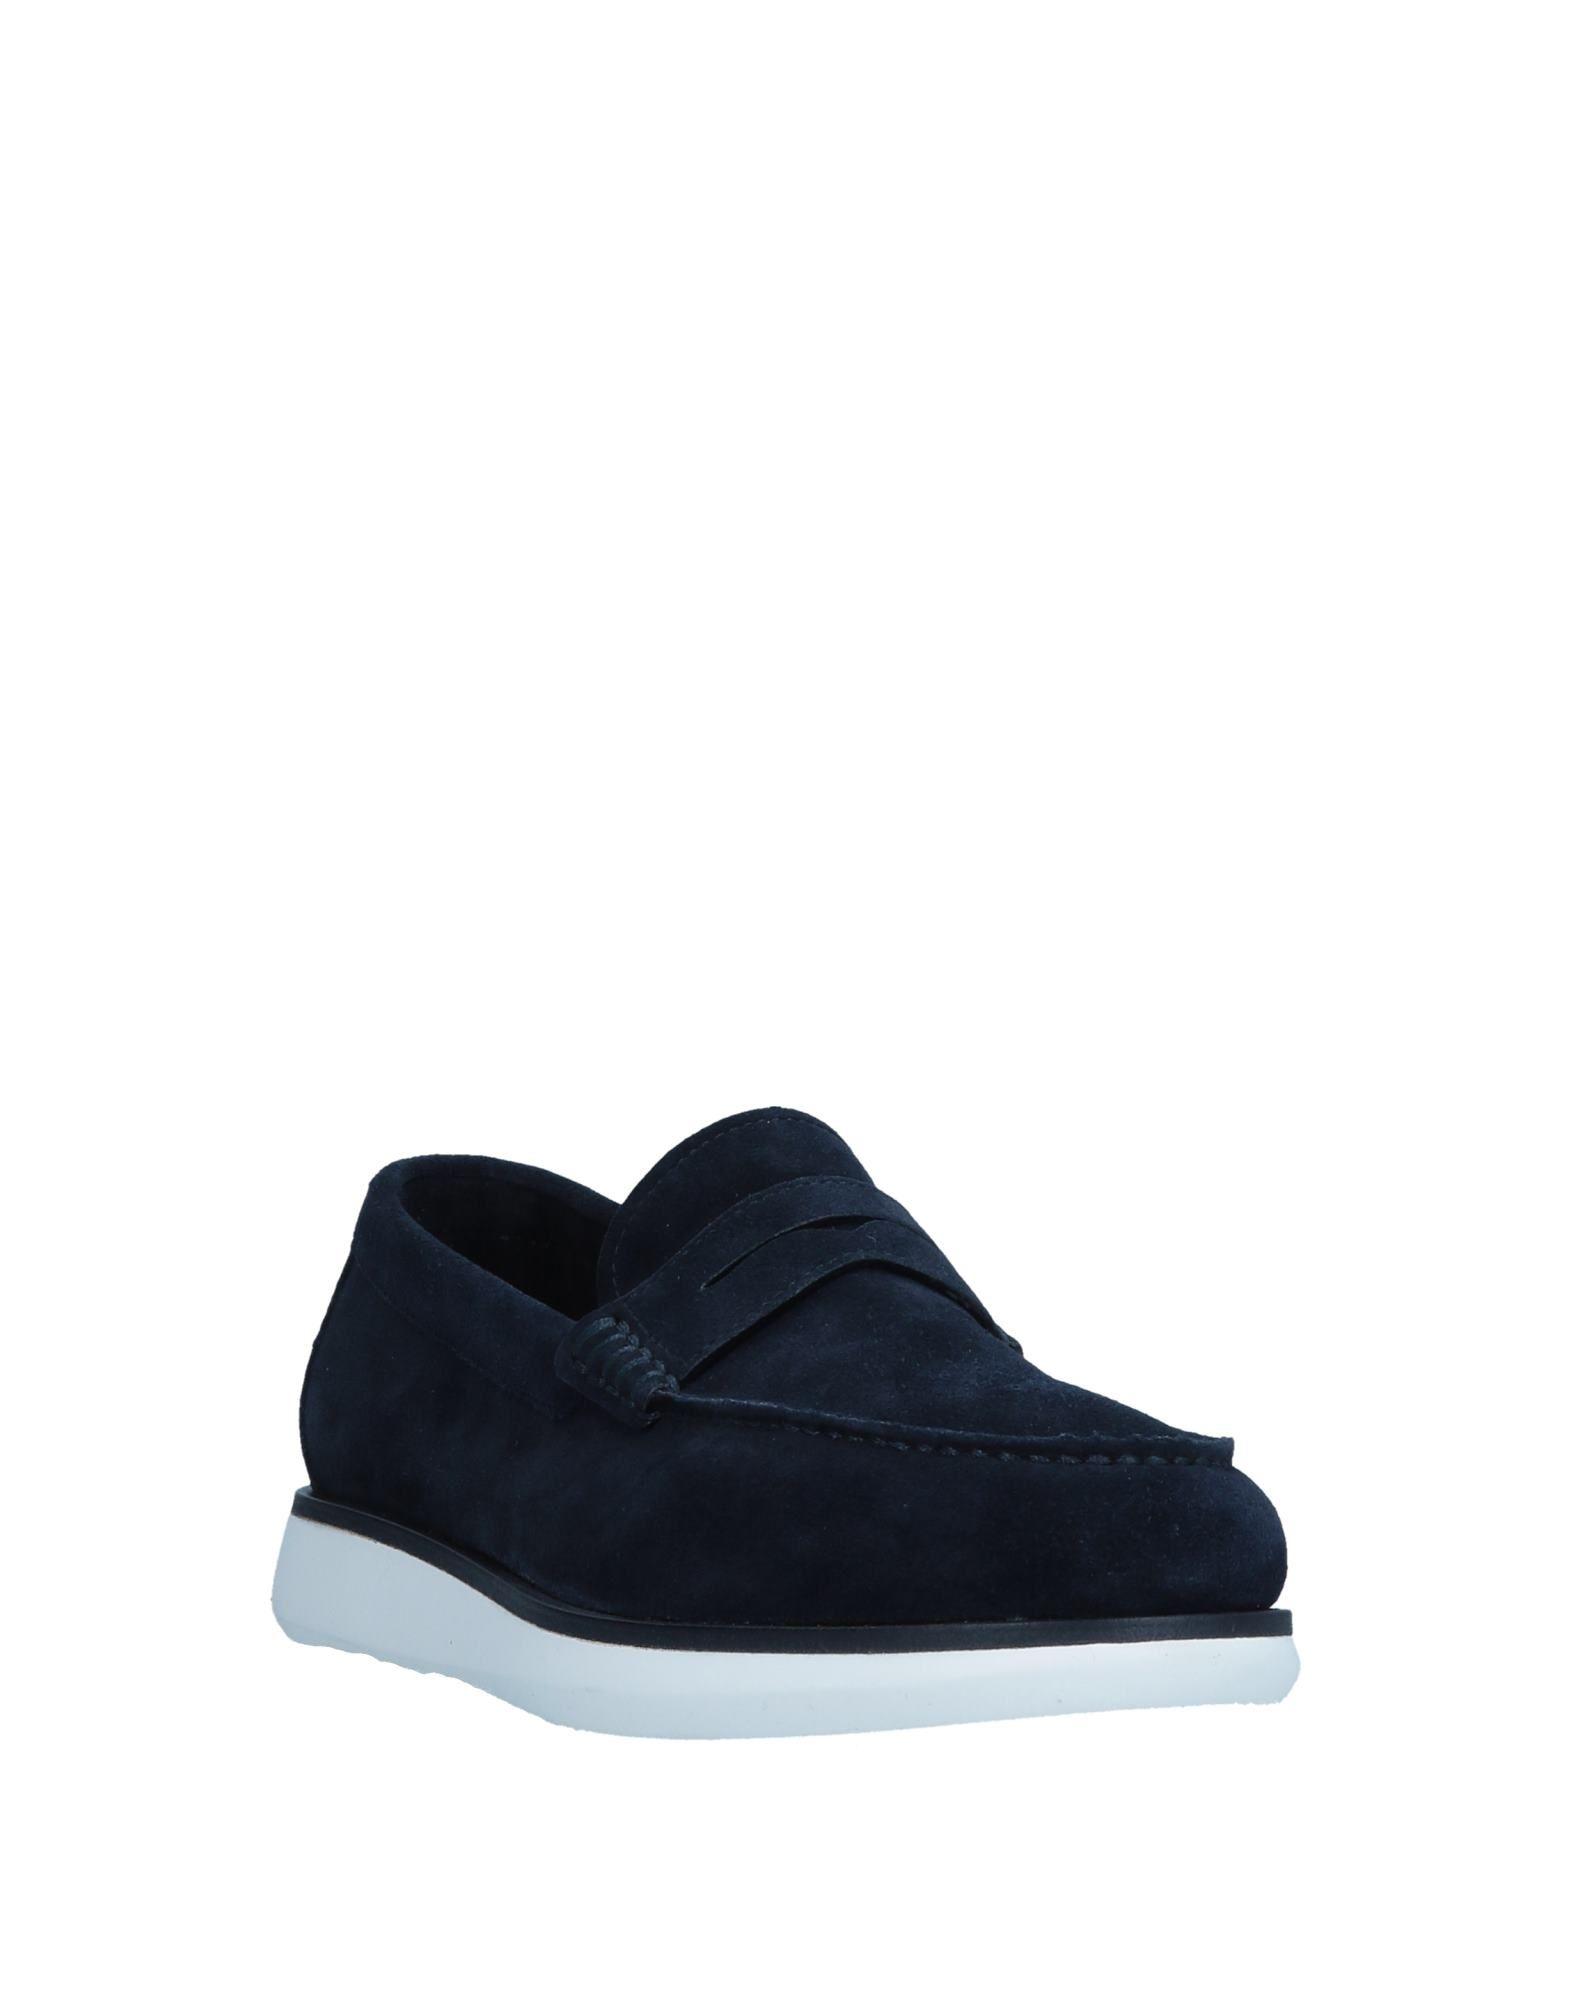 Giorgio Armani Mokassins Qualität Herren  11552541BL Gute Qualität Mokassins beliebte Schuhe 925102